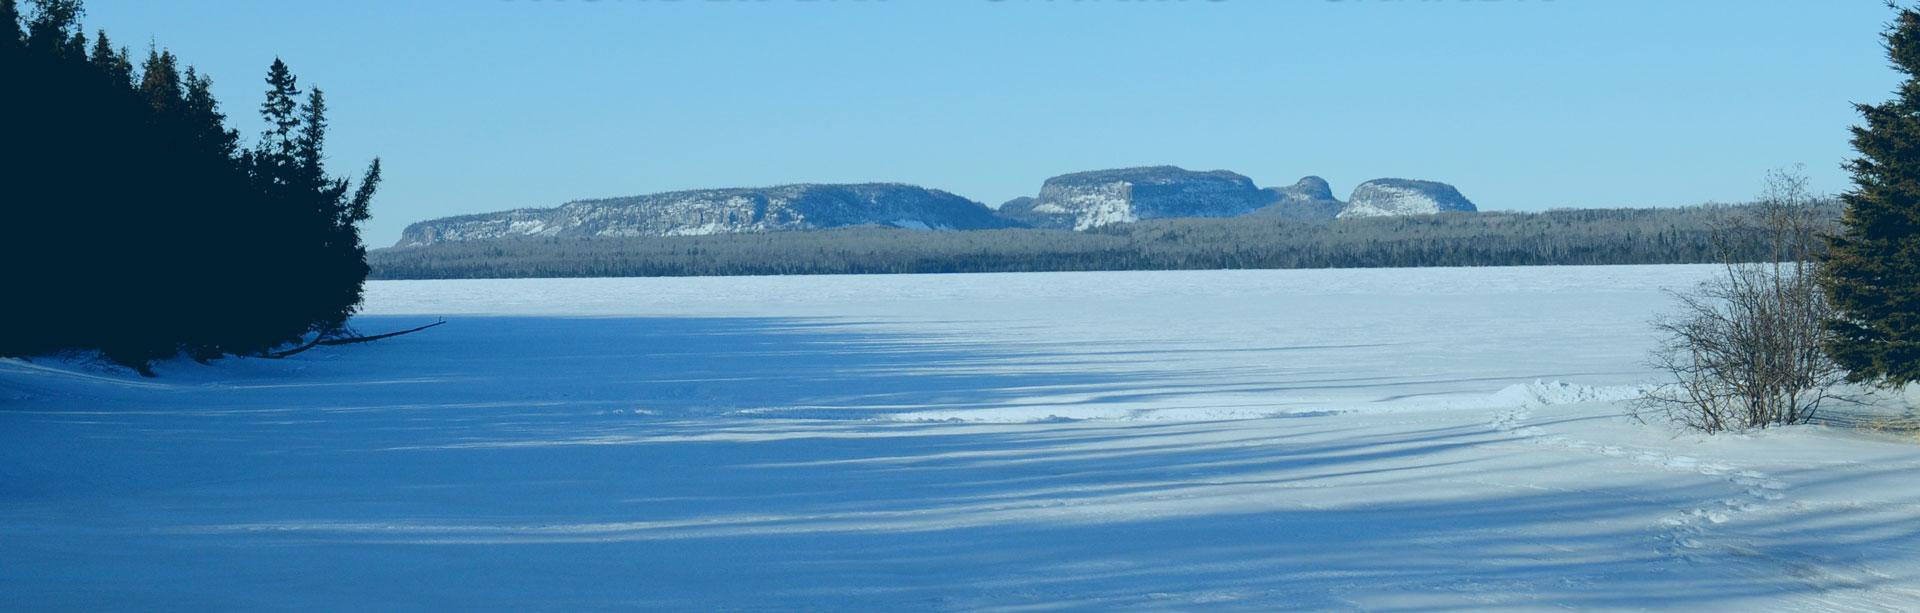 Sleeping giant provincial park nordic ski trails